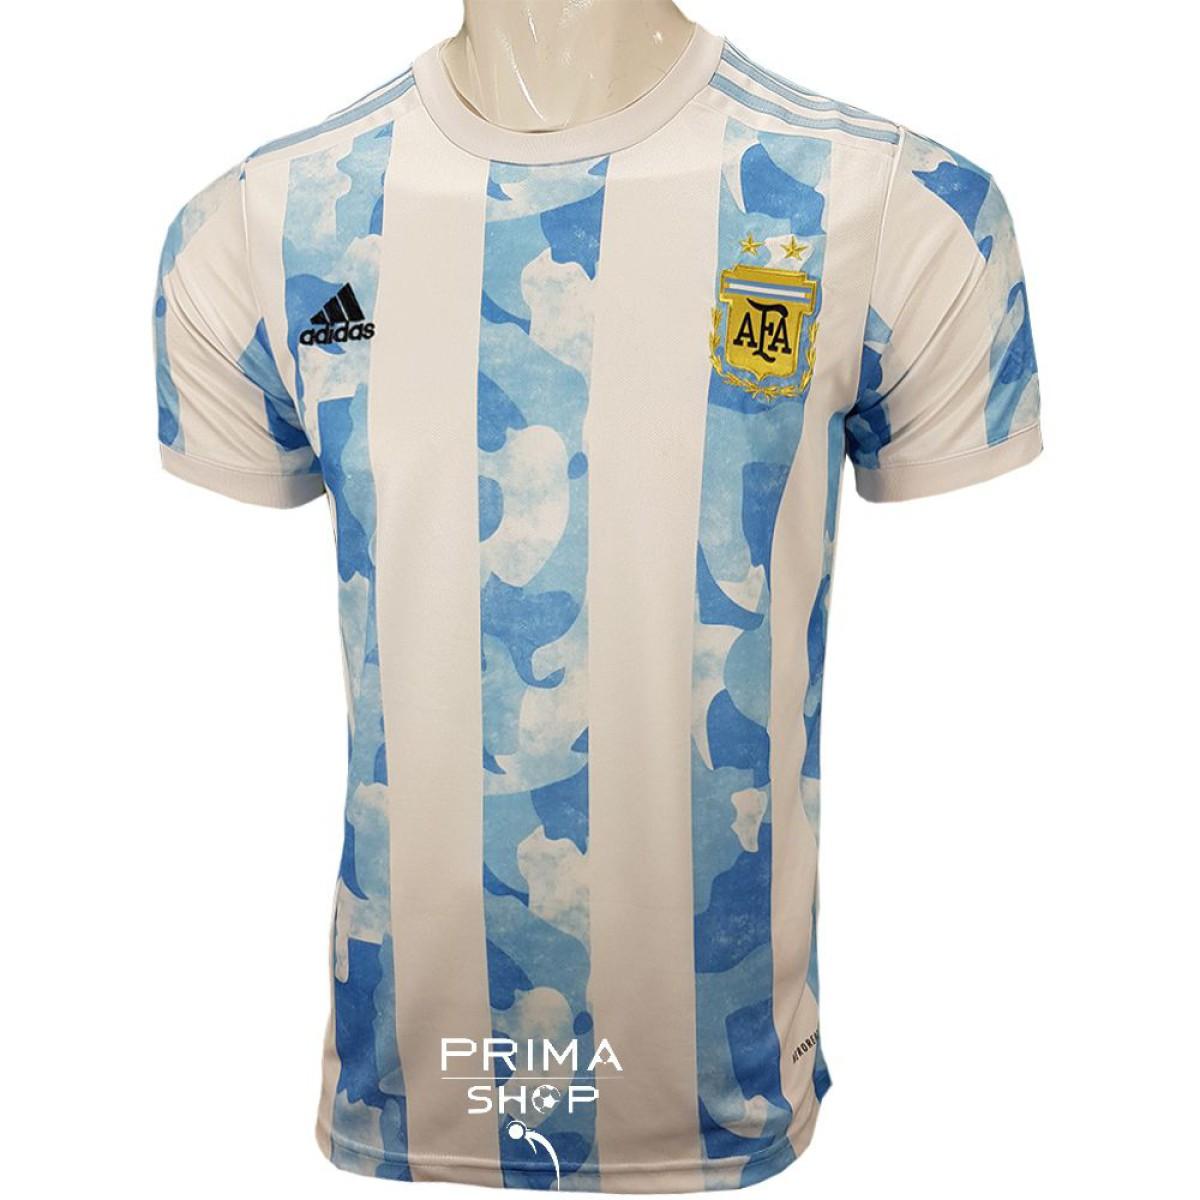 لباس آرژانتین 2021